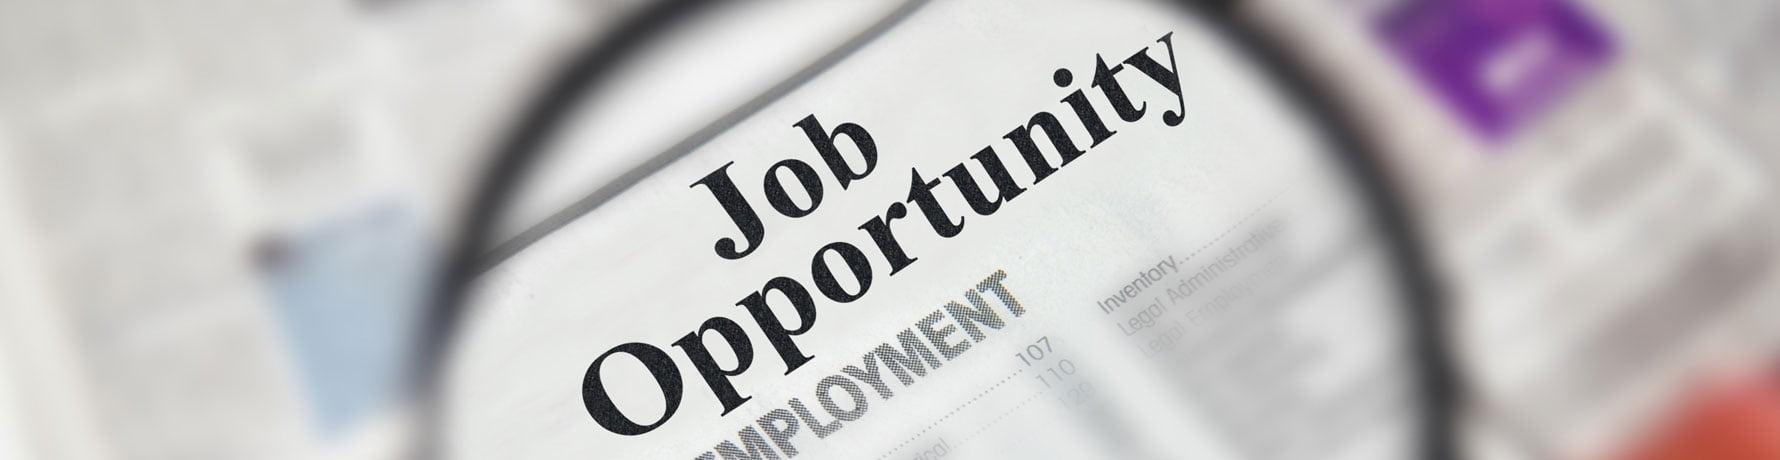 Buscar Trabajo en Australia